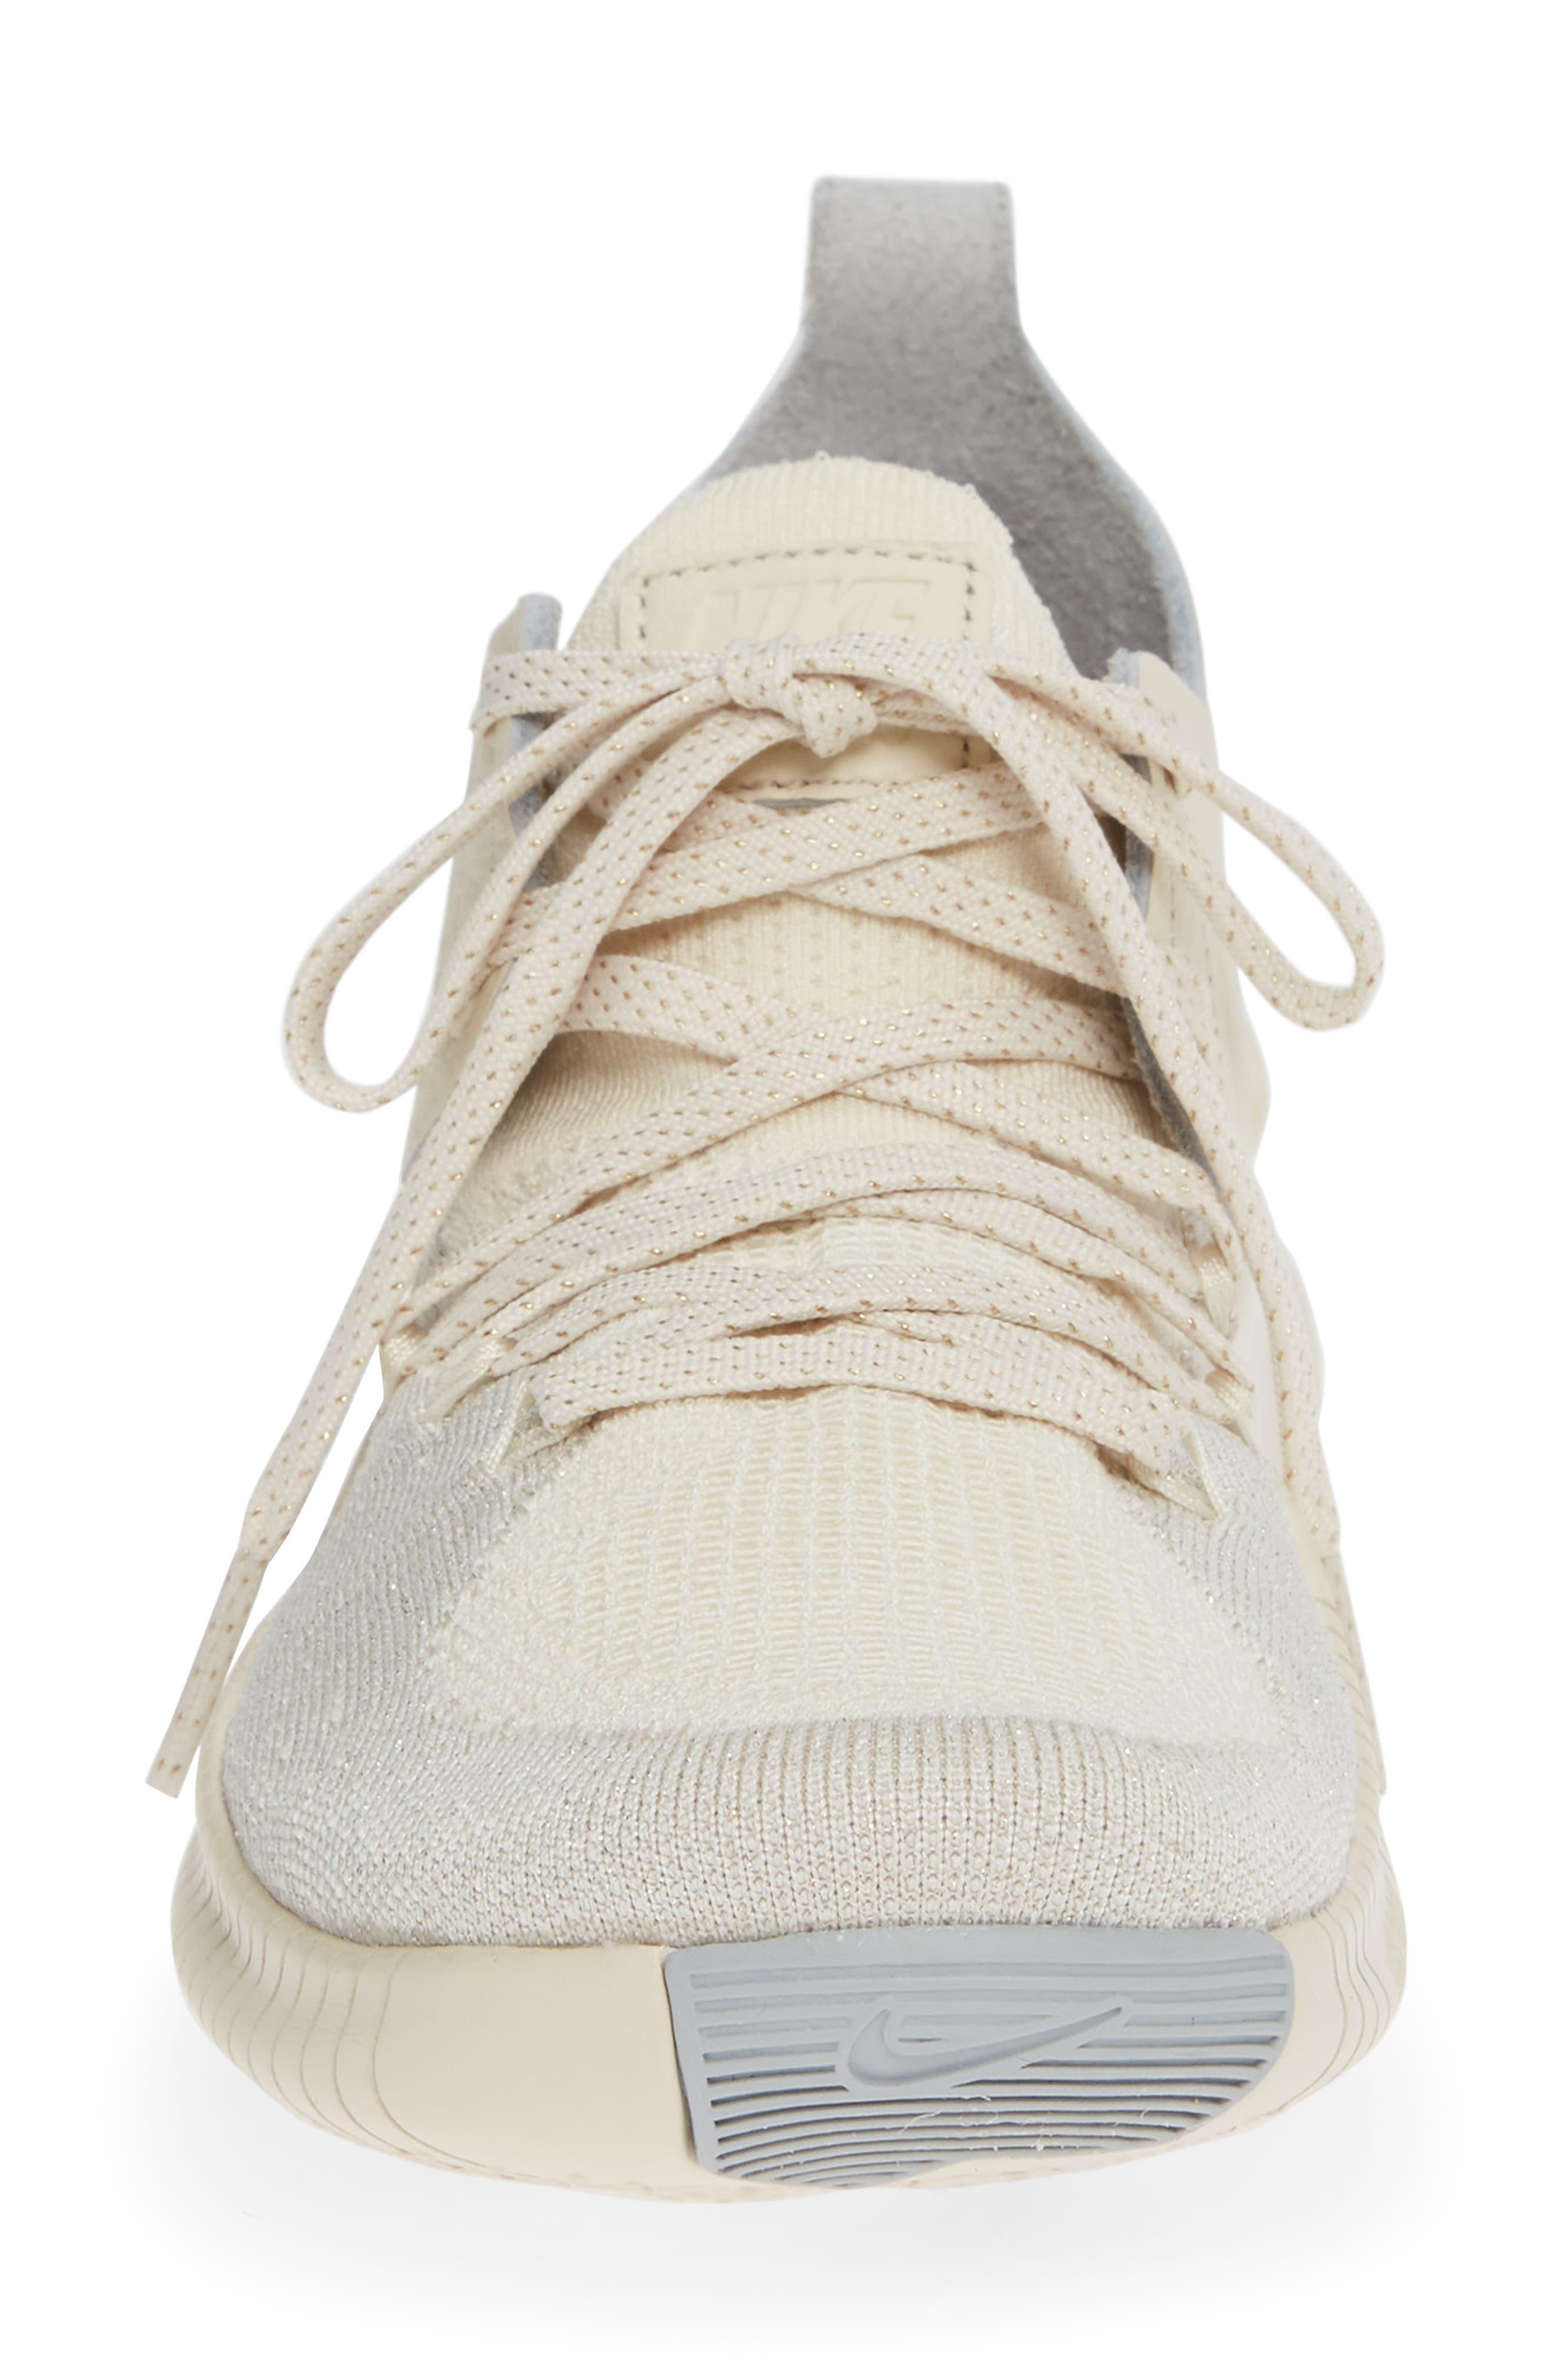 NIKE,                             Free TR Flyknit 3 Training Shoe,                             Alternate thumbnail 4, color,                             900